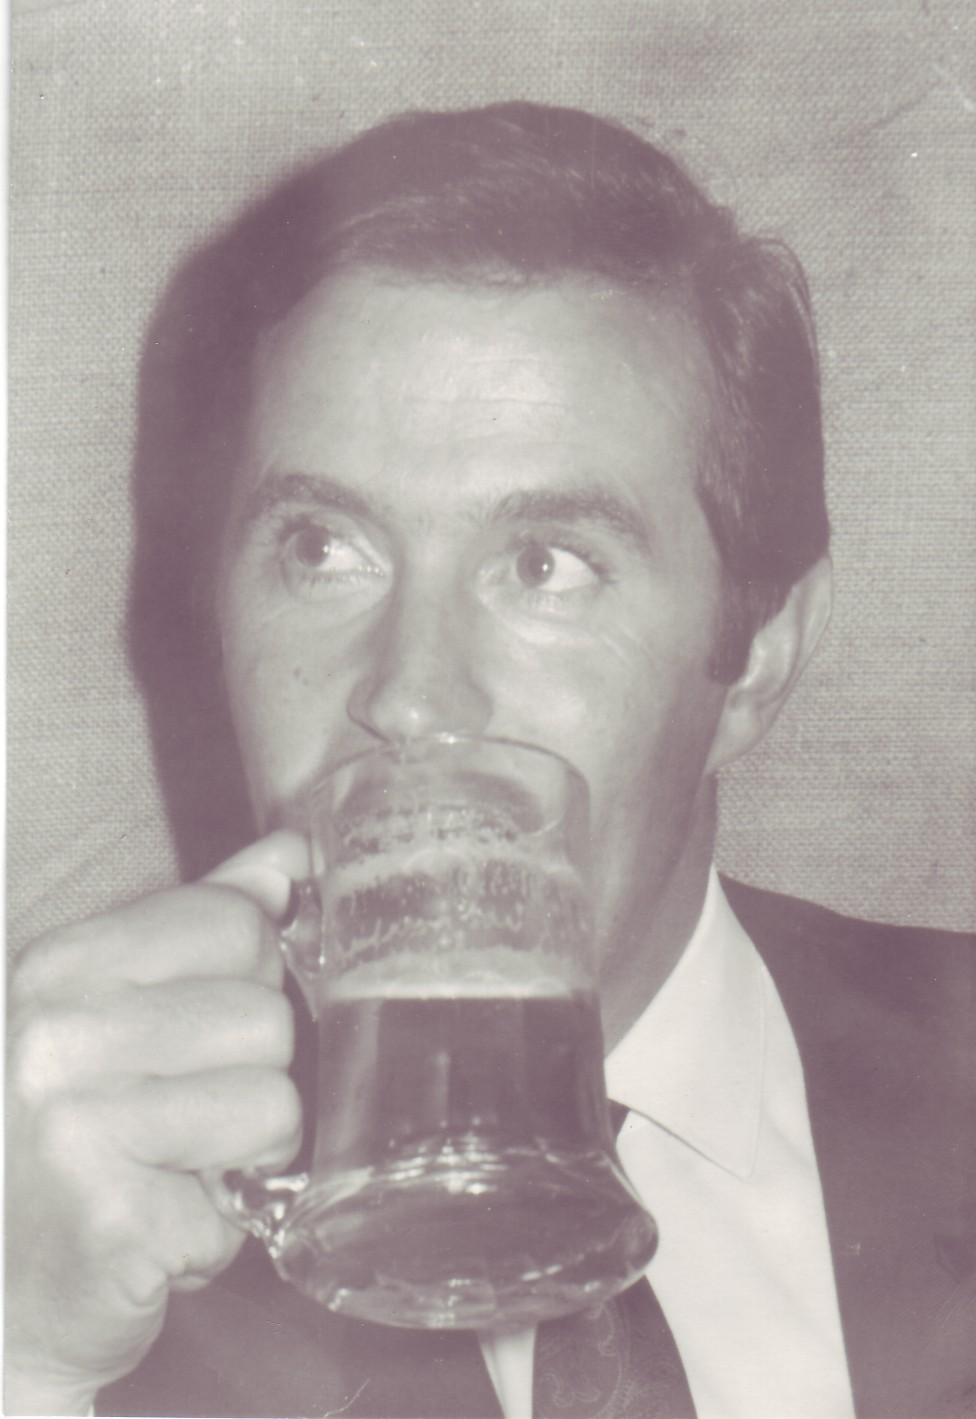 1968 Manfred Bieri